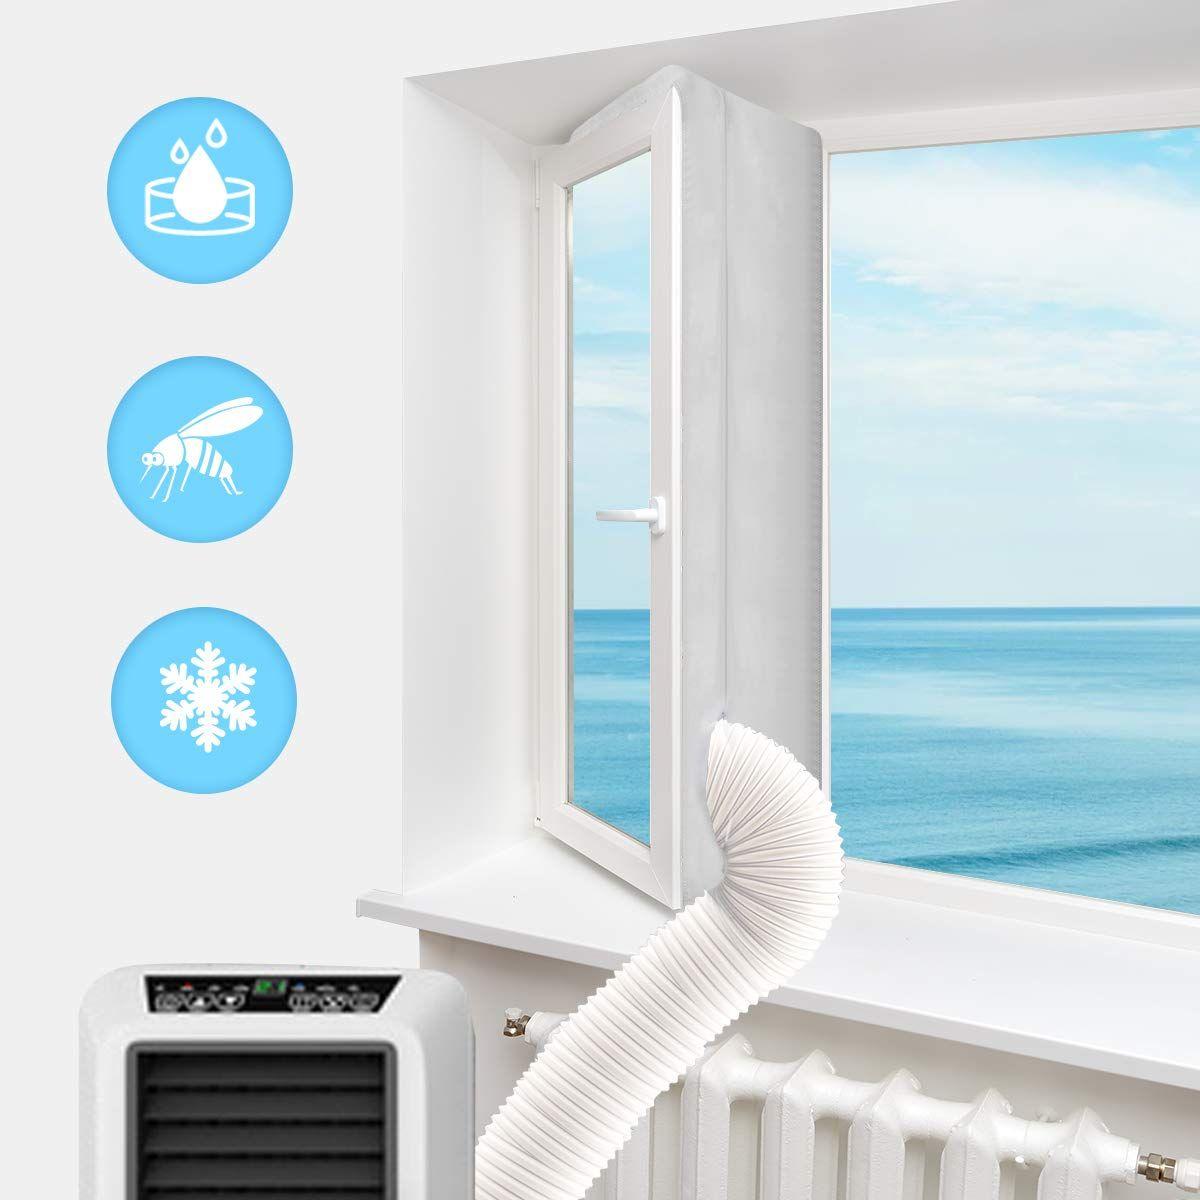 Portable Air Conditioner Window Seal Kit Luxiv 158 Inches Window Seal Kit For In 2020 Portable Air Conditioner Window Portable Air Conditioning Window Air Conditioner